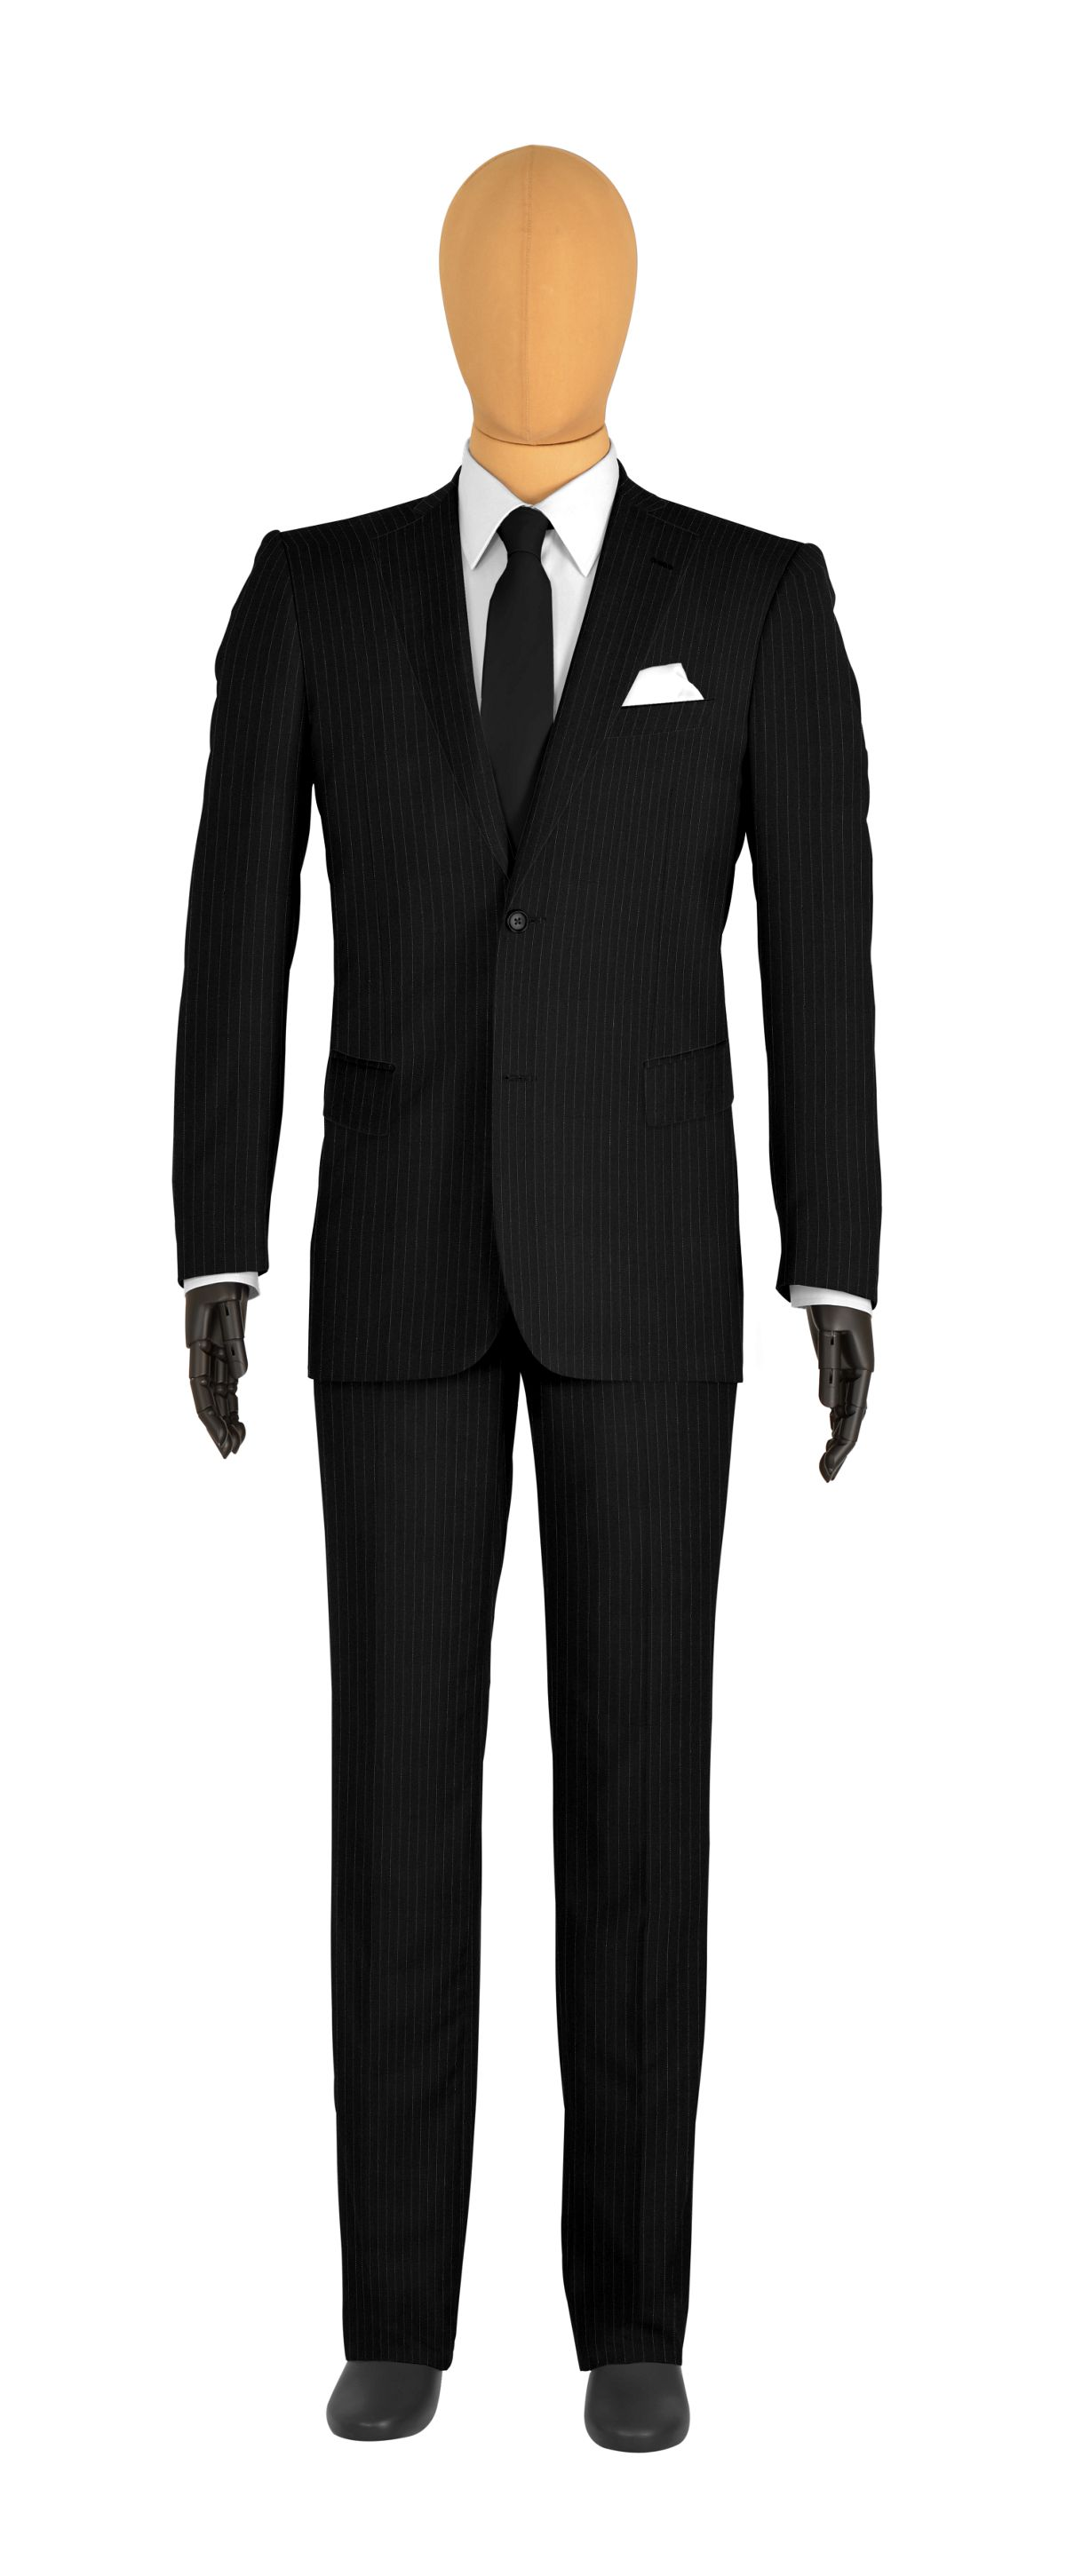 Costume 2 boutons noir à rayures tennis